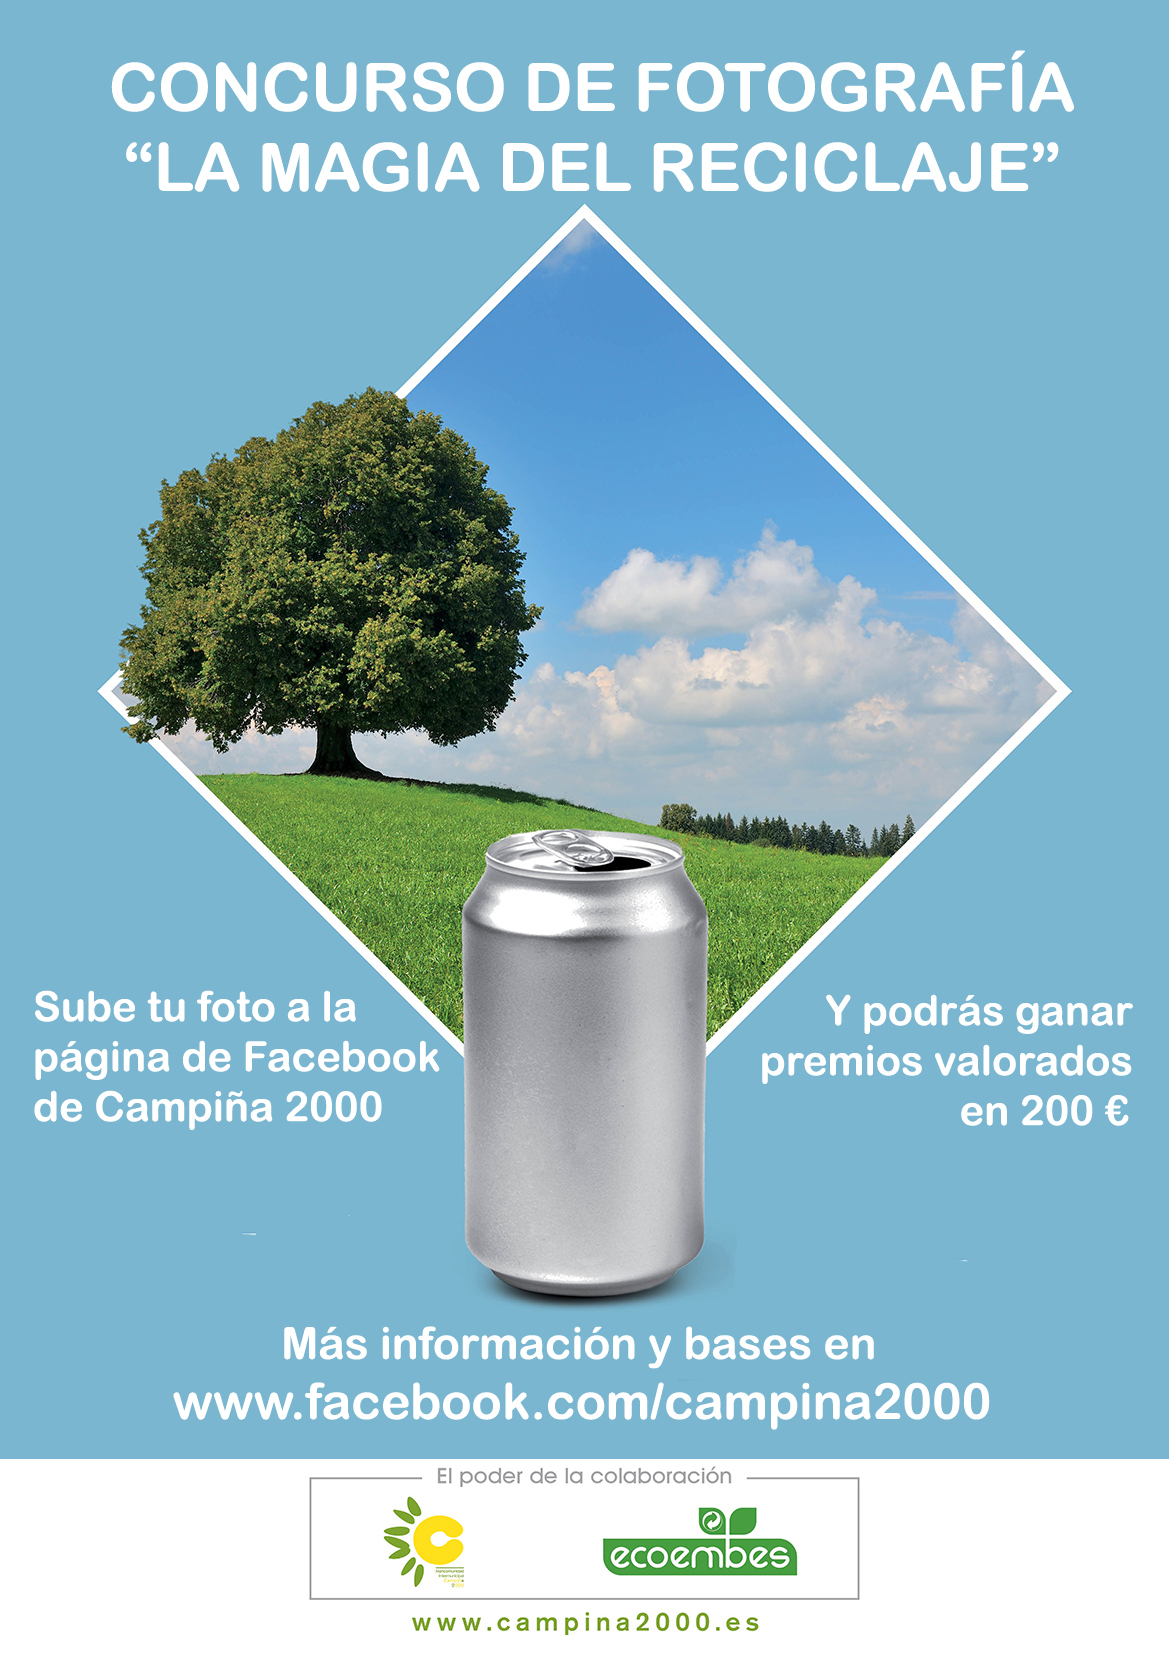 Concurso fotografía Facebook Campiña2000